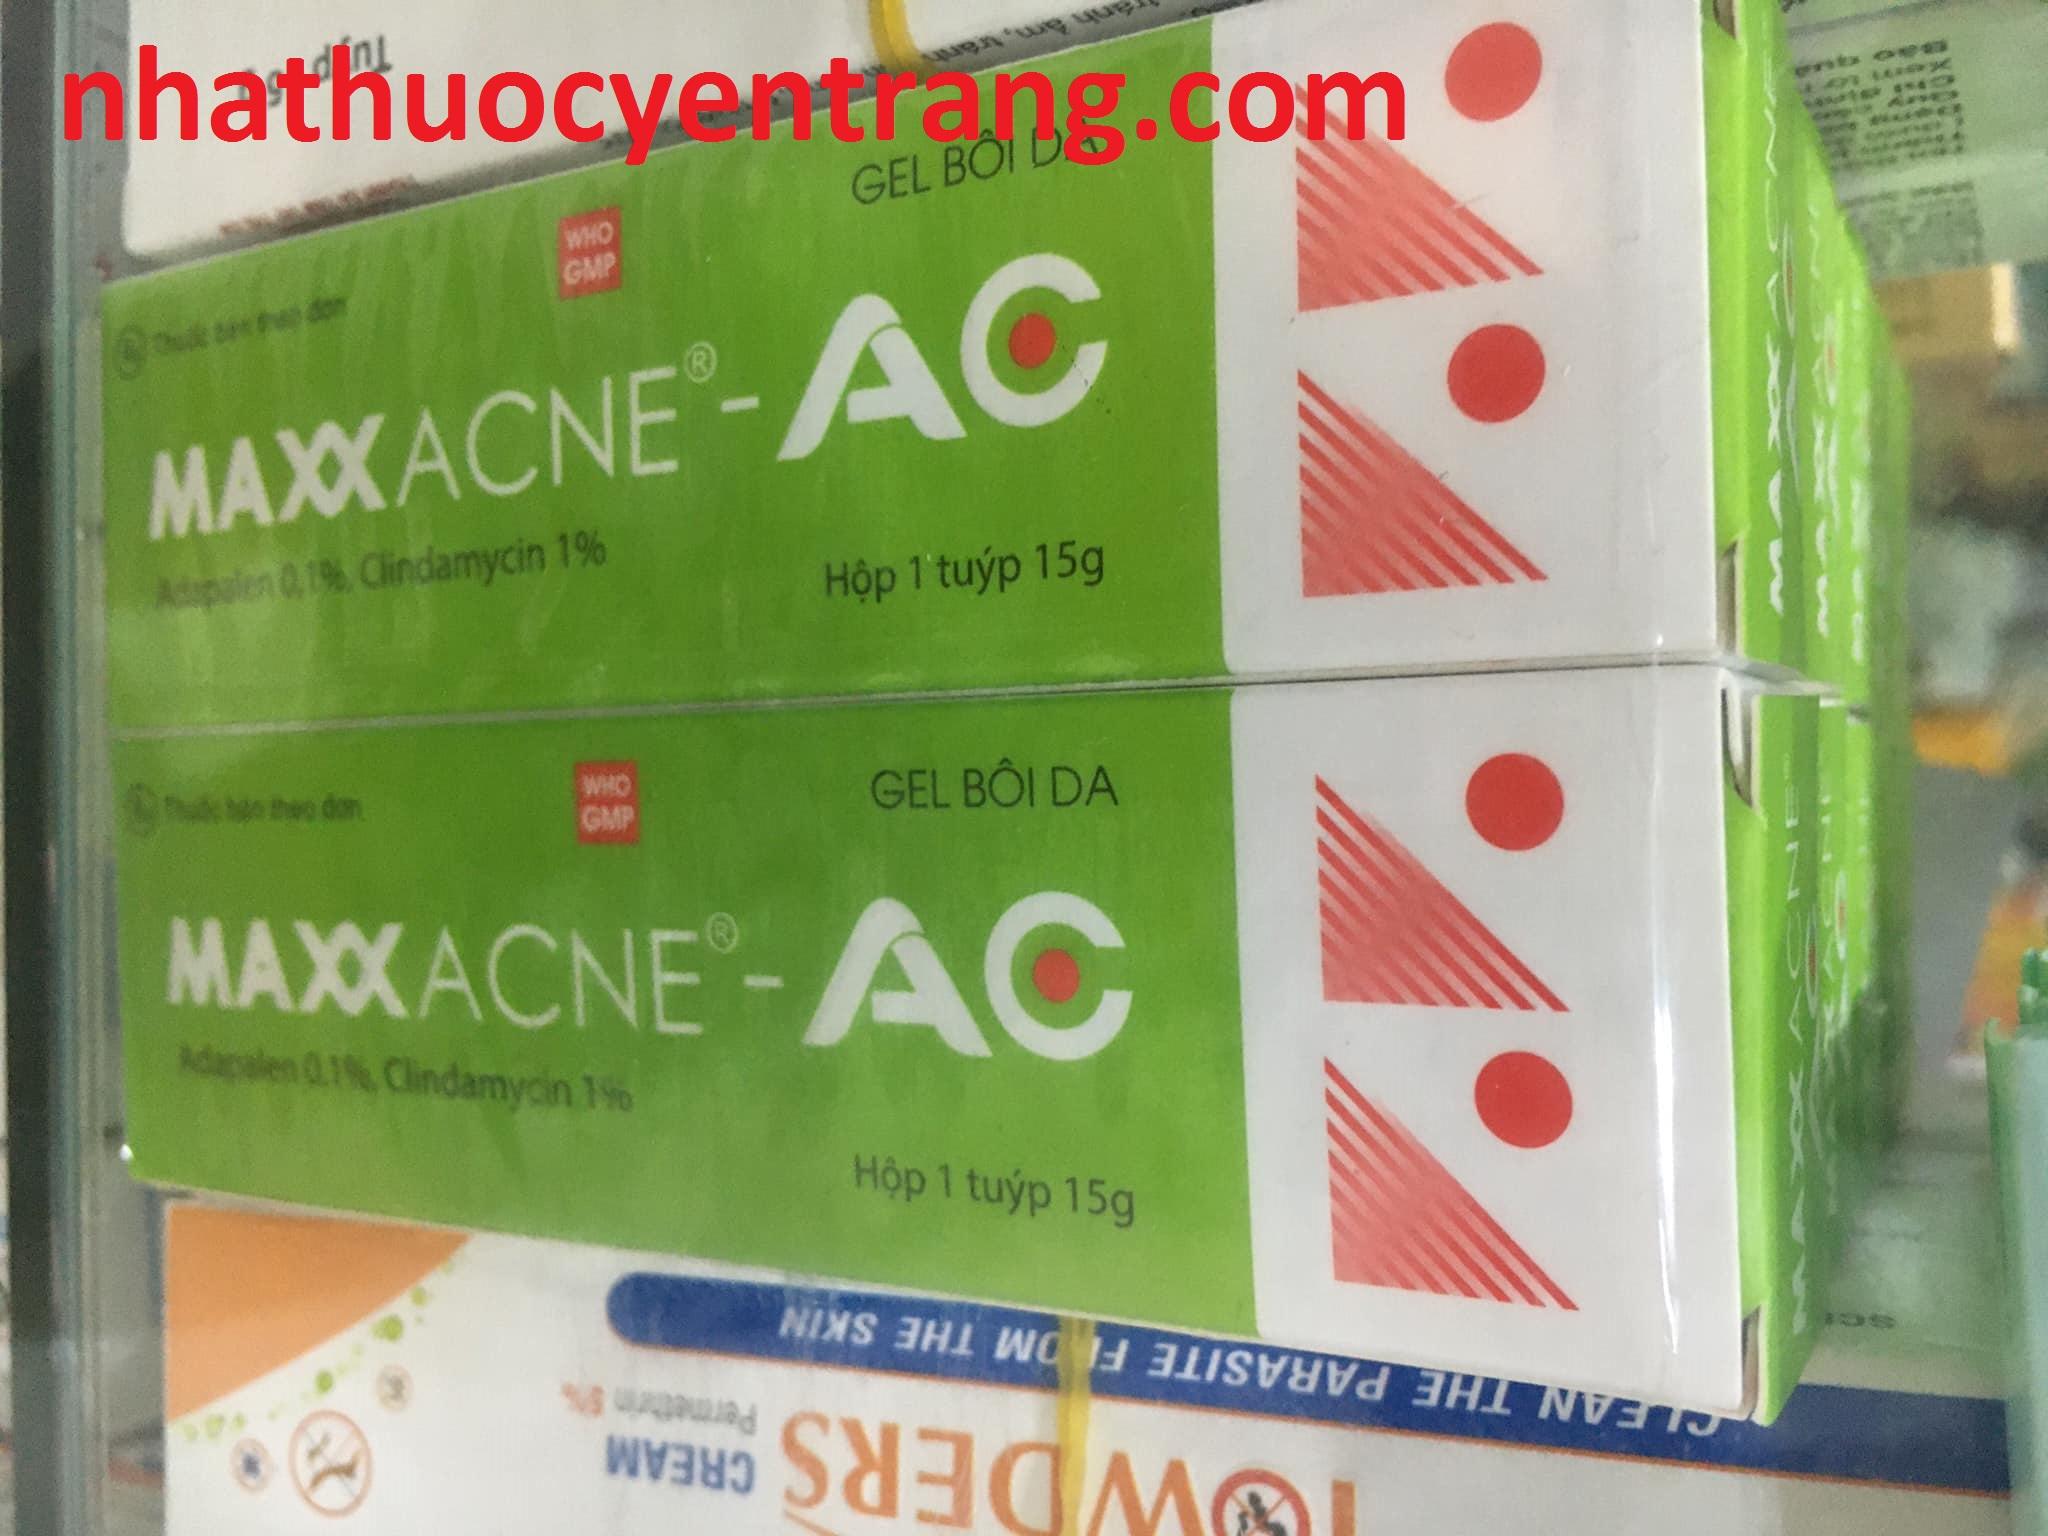 Maxx Acne - AC 15g